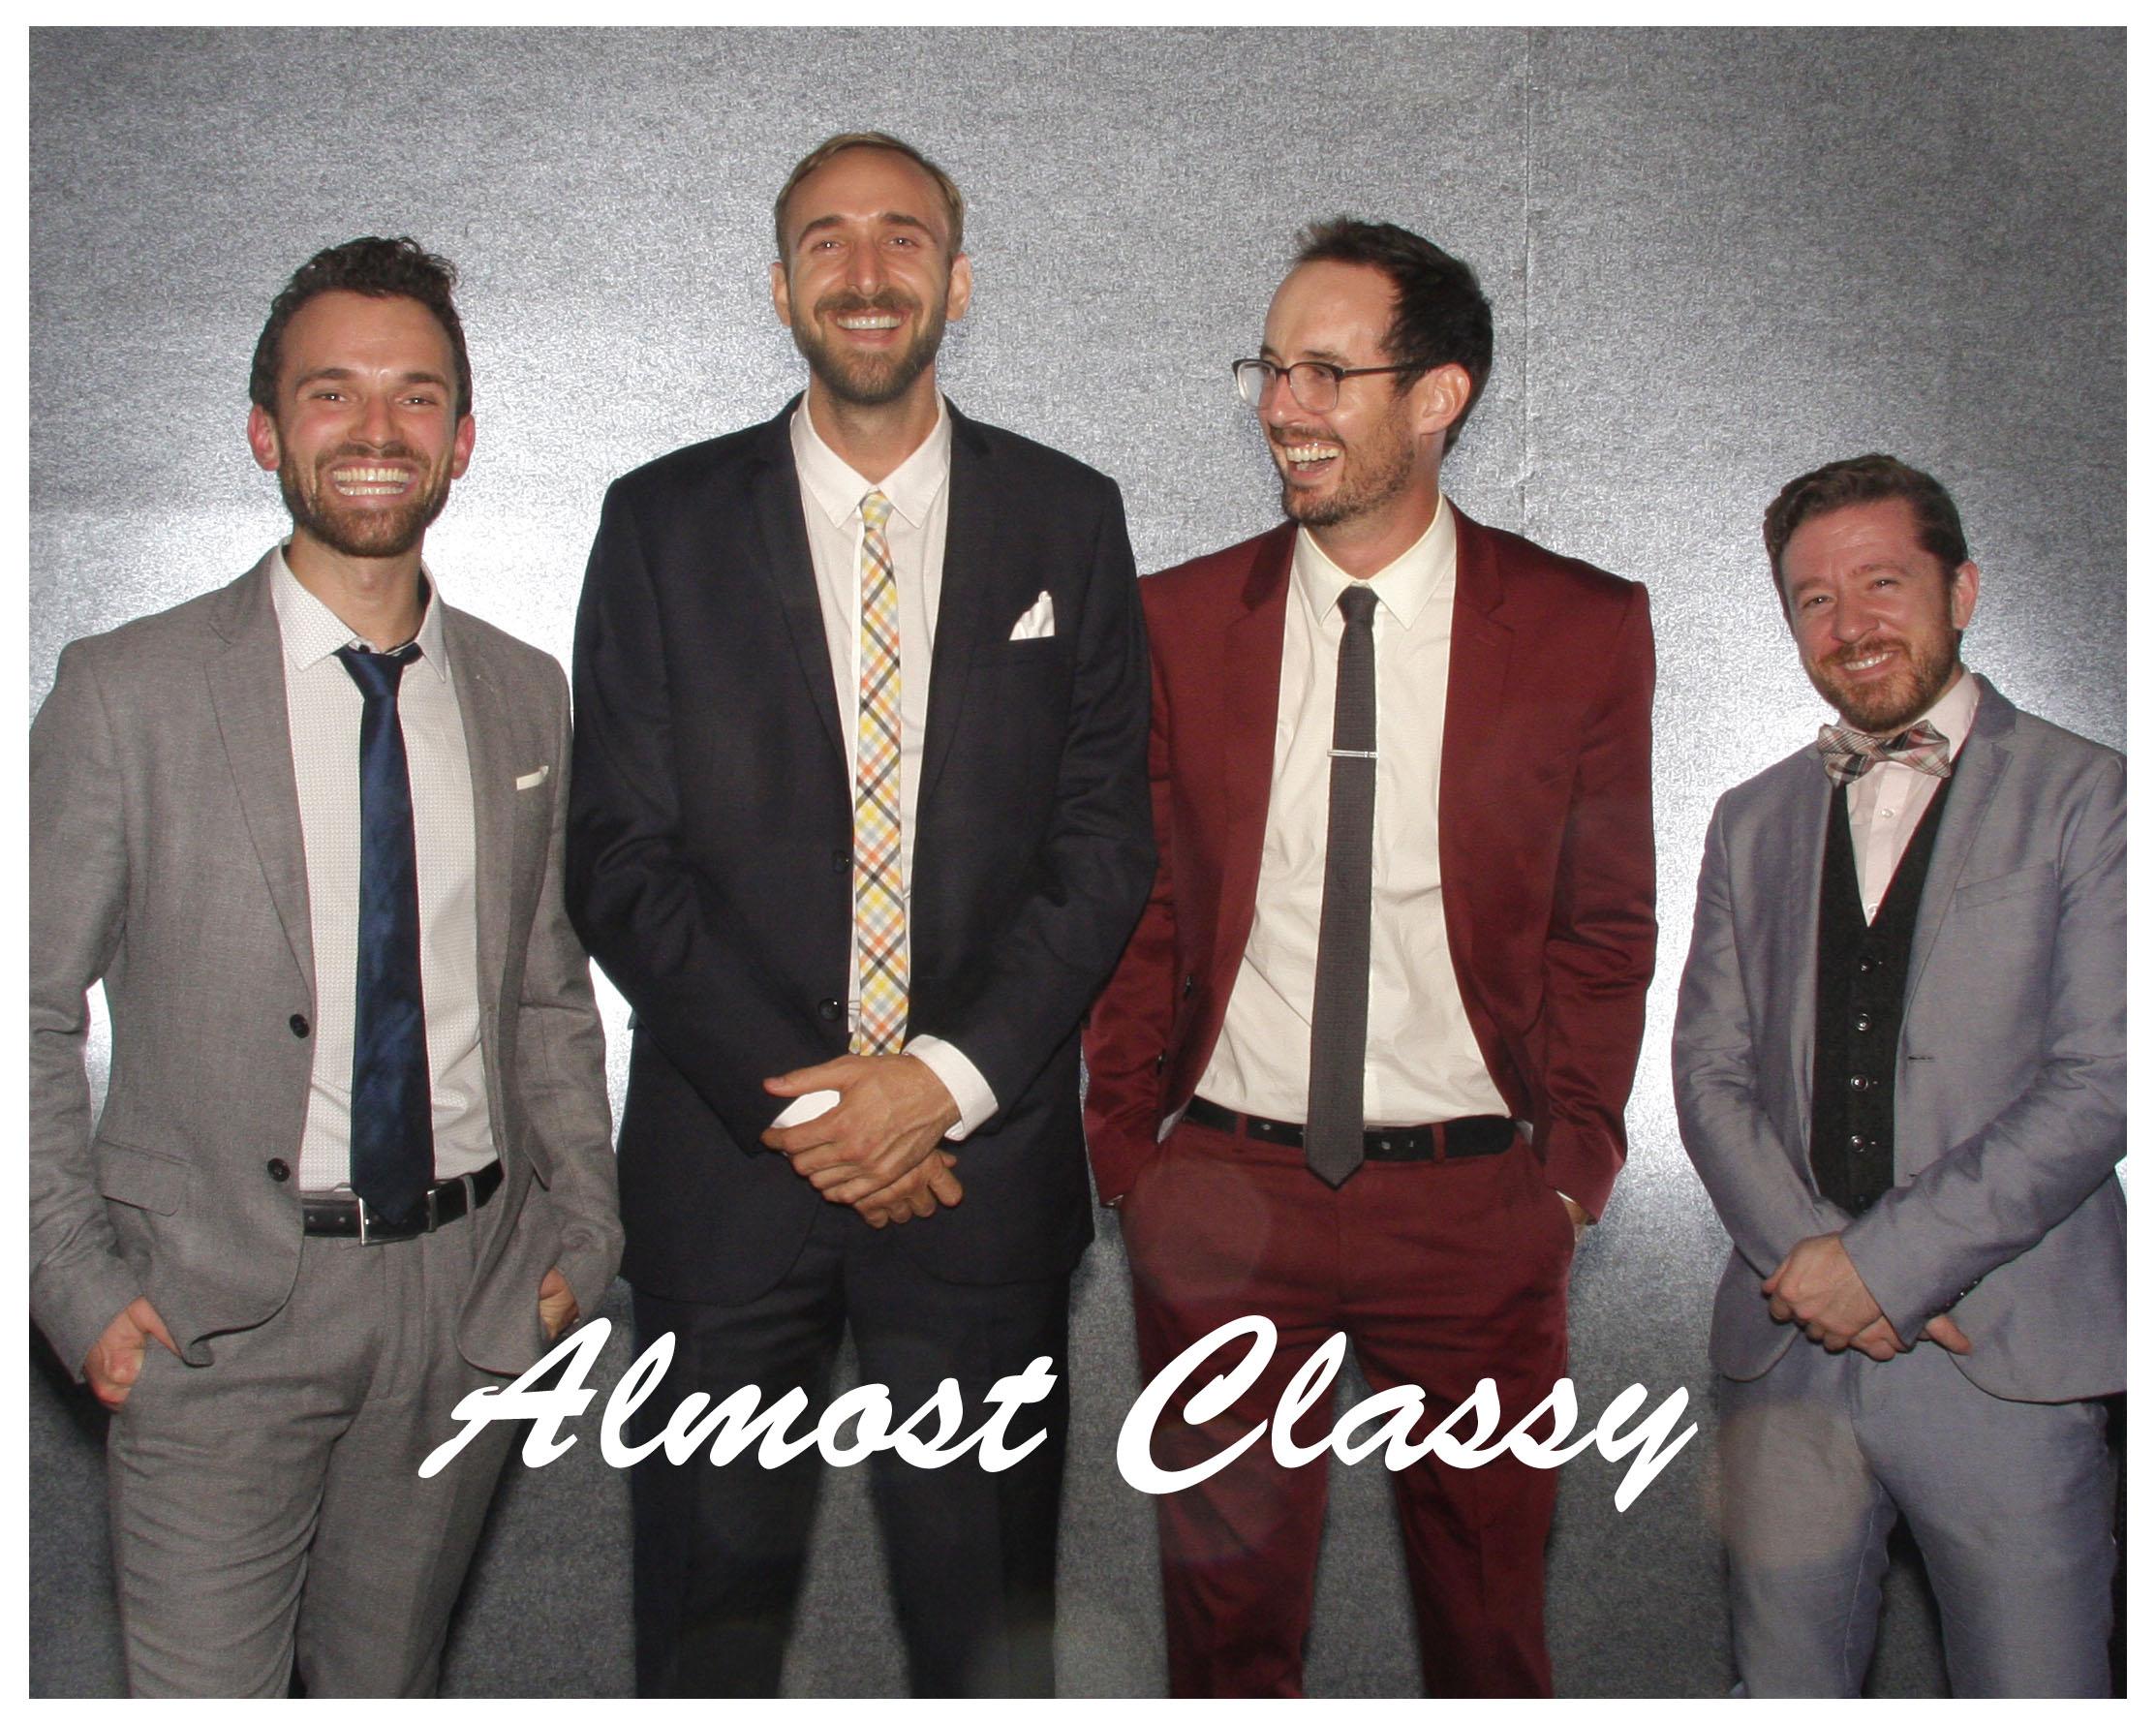 Almost Classy 1.jpg